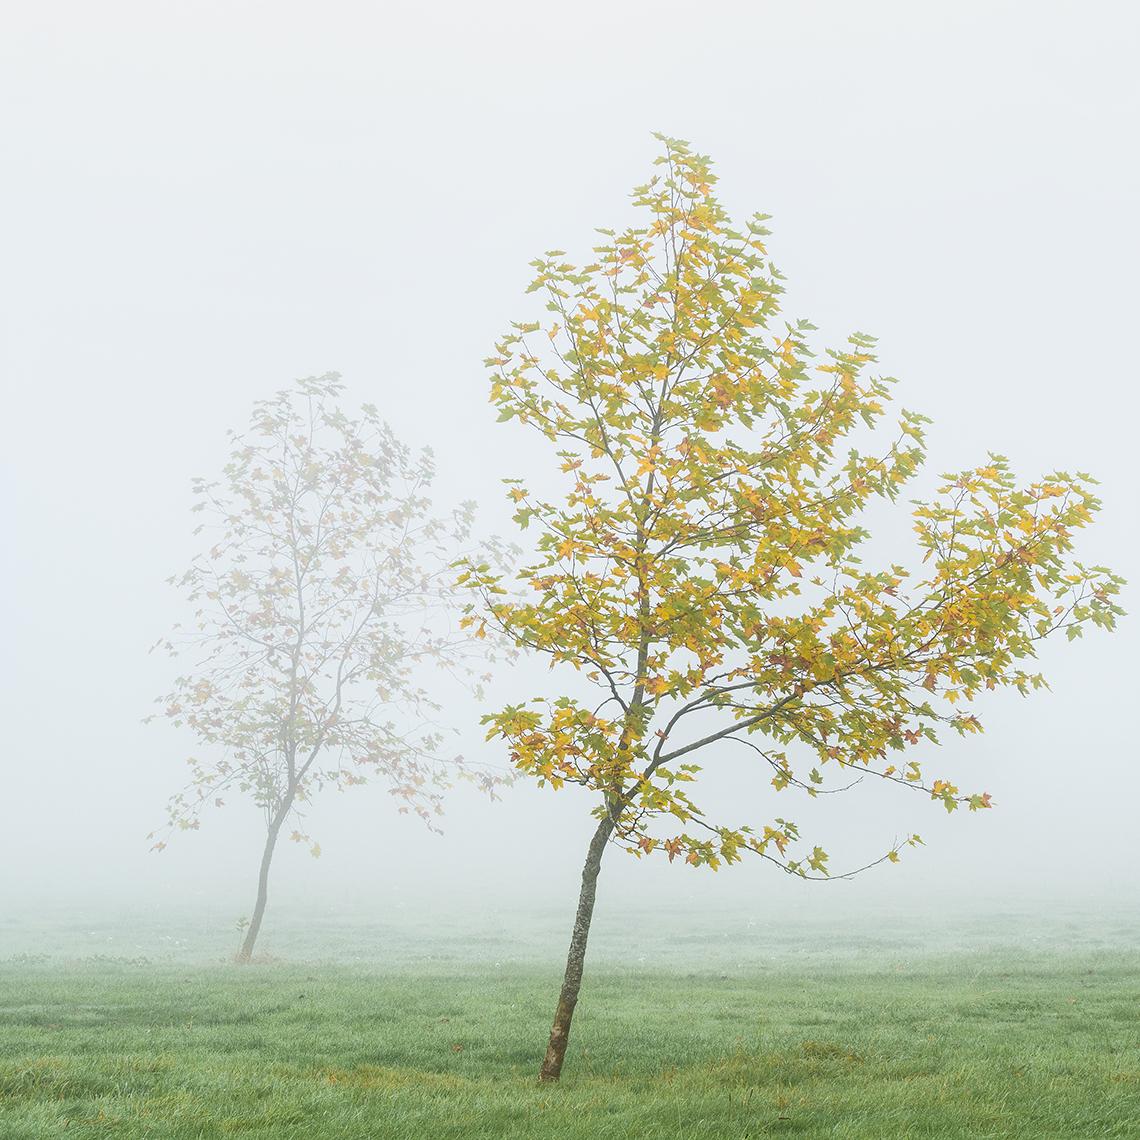 Landscape Photography of misty trees